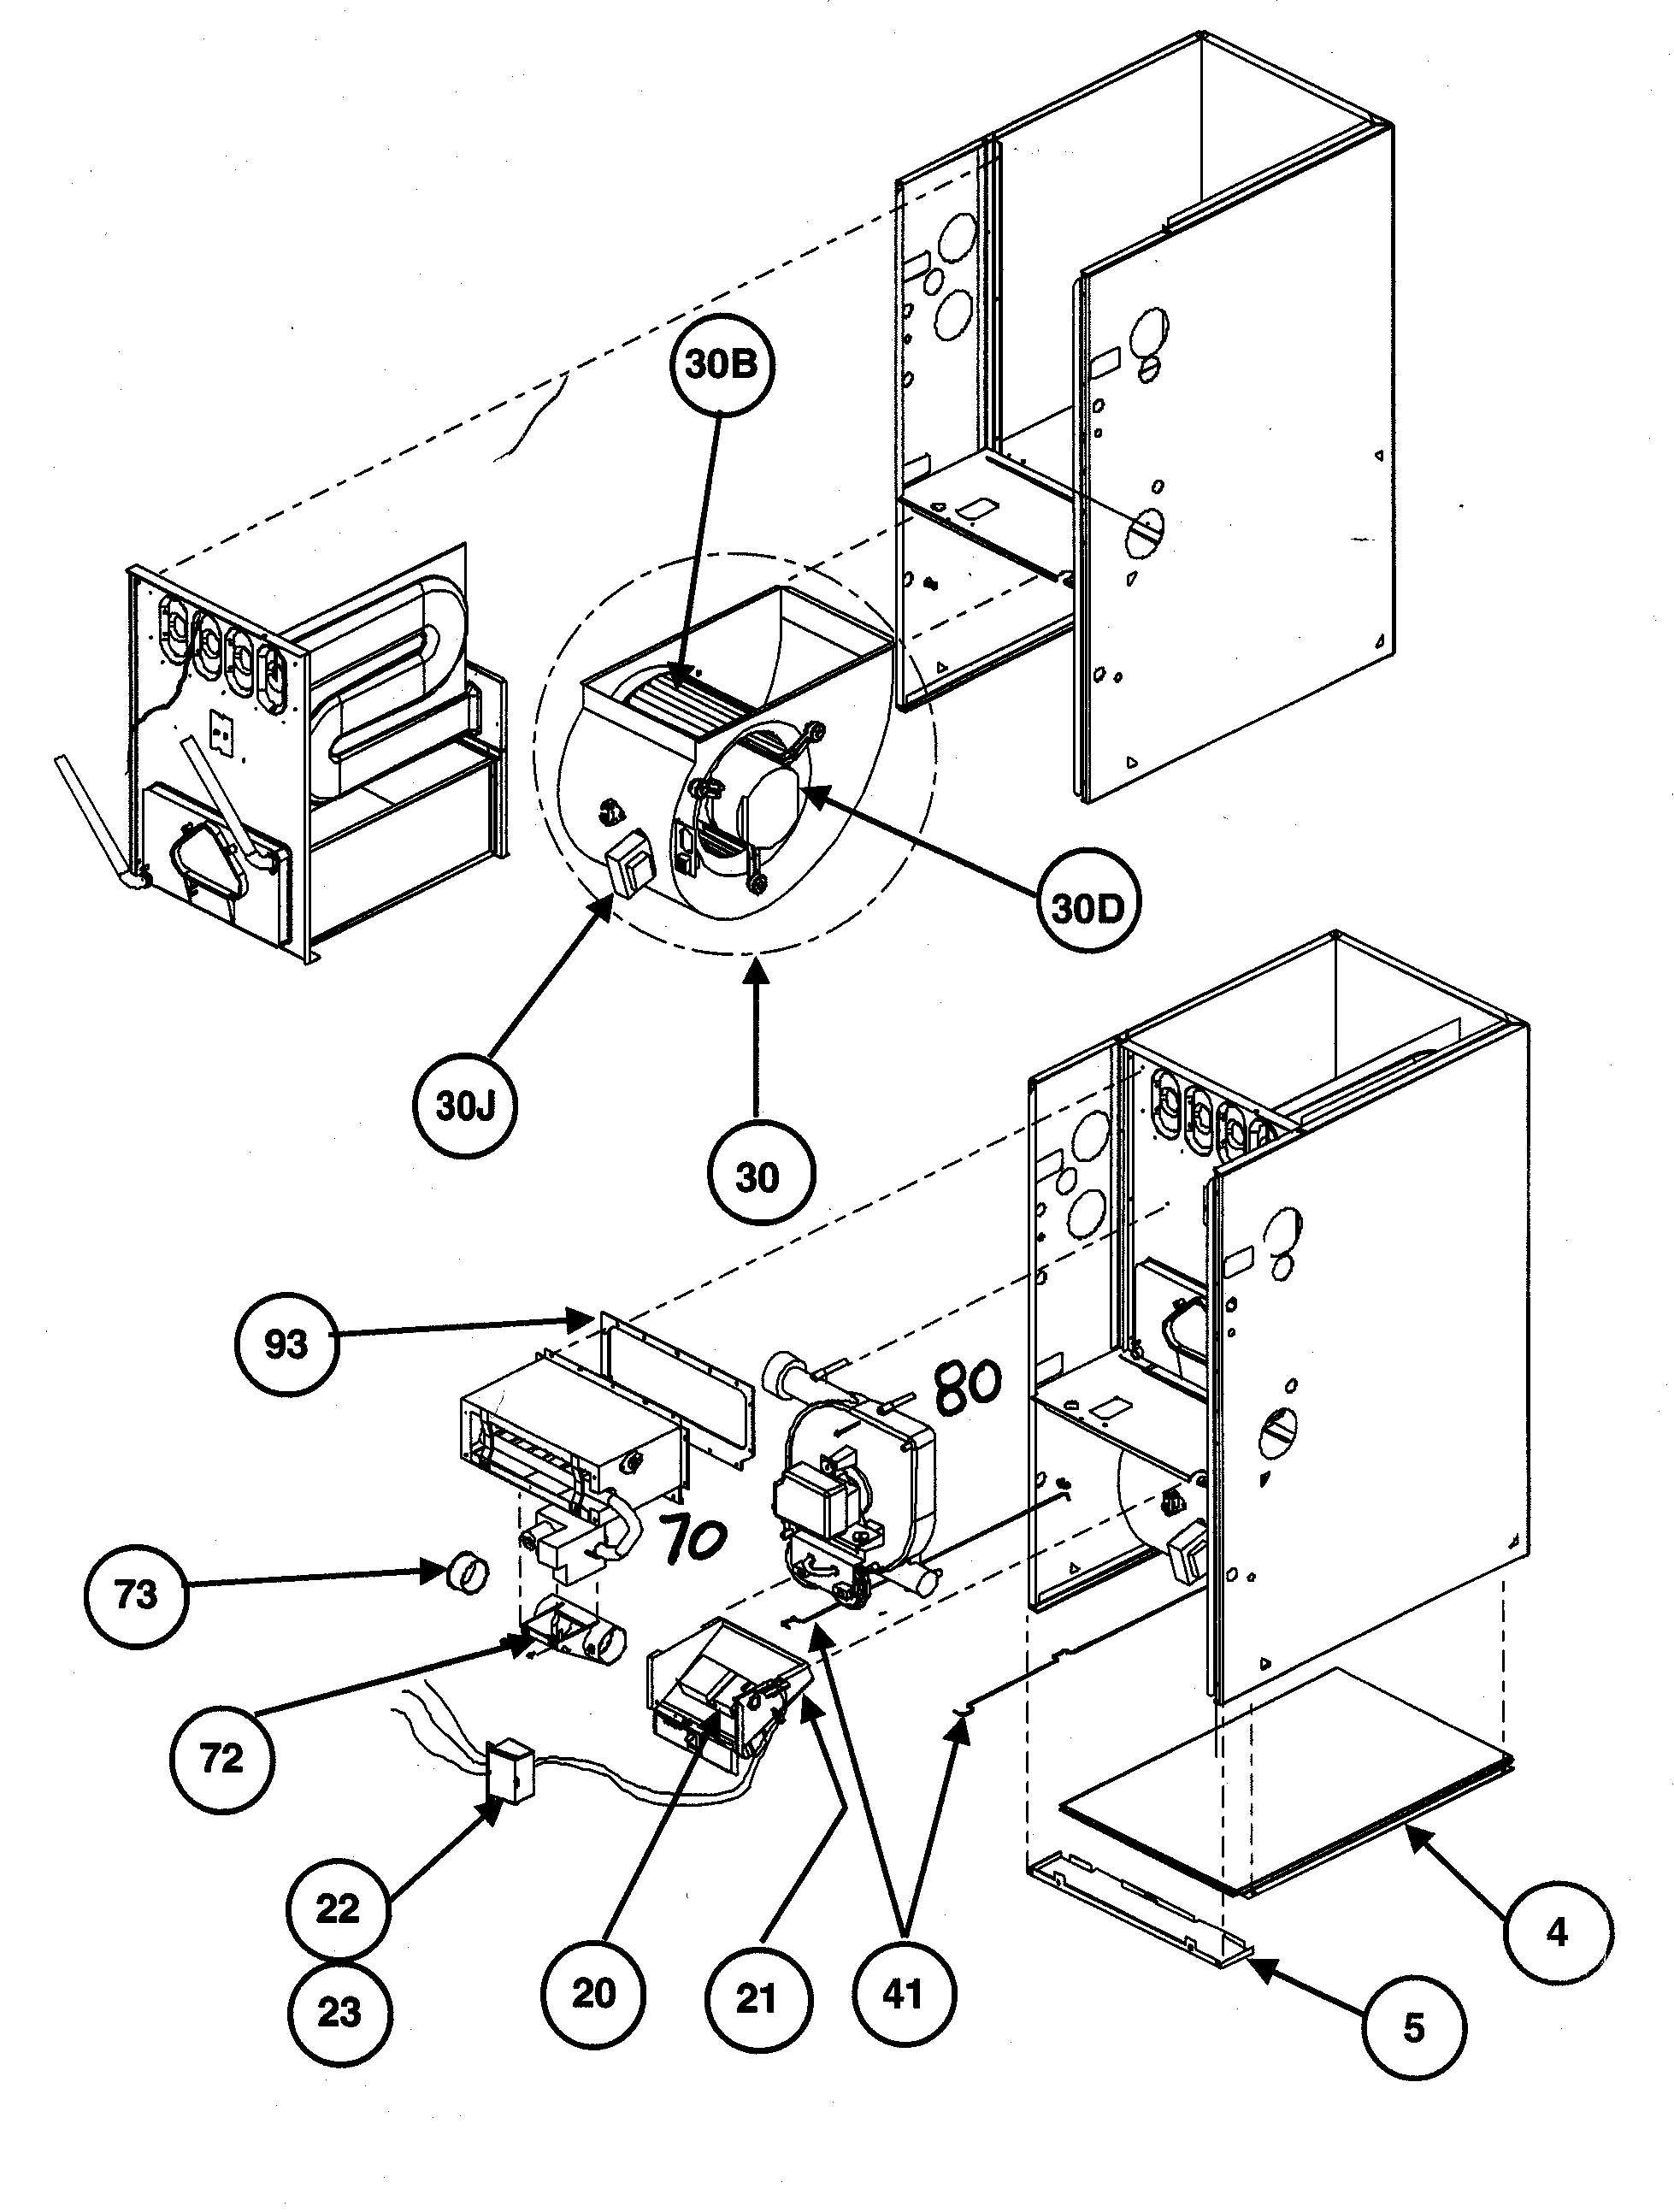 carrier chiller 30 gh wiring diagram honda cb750k furnace parts 48gh circuit symbols